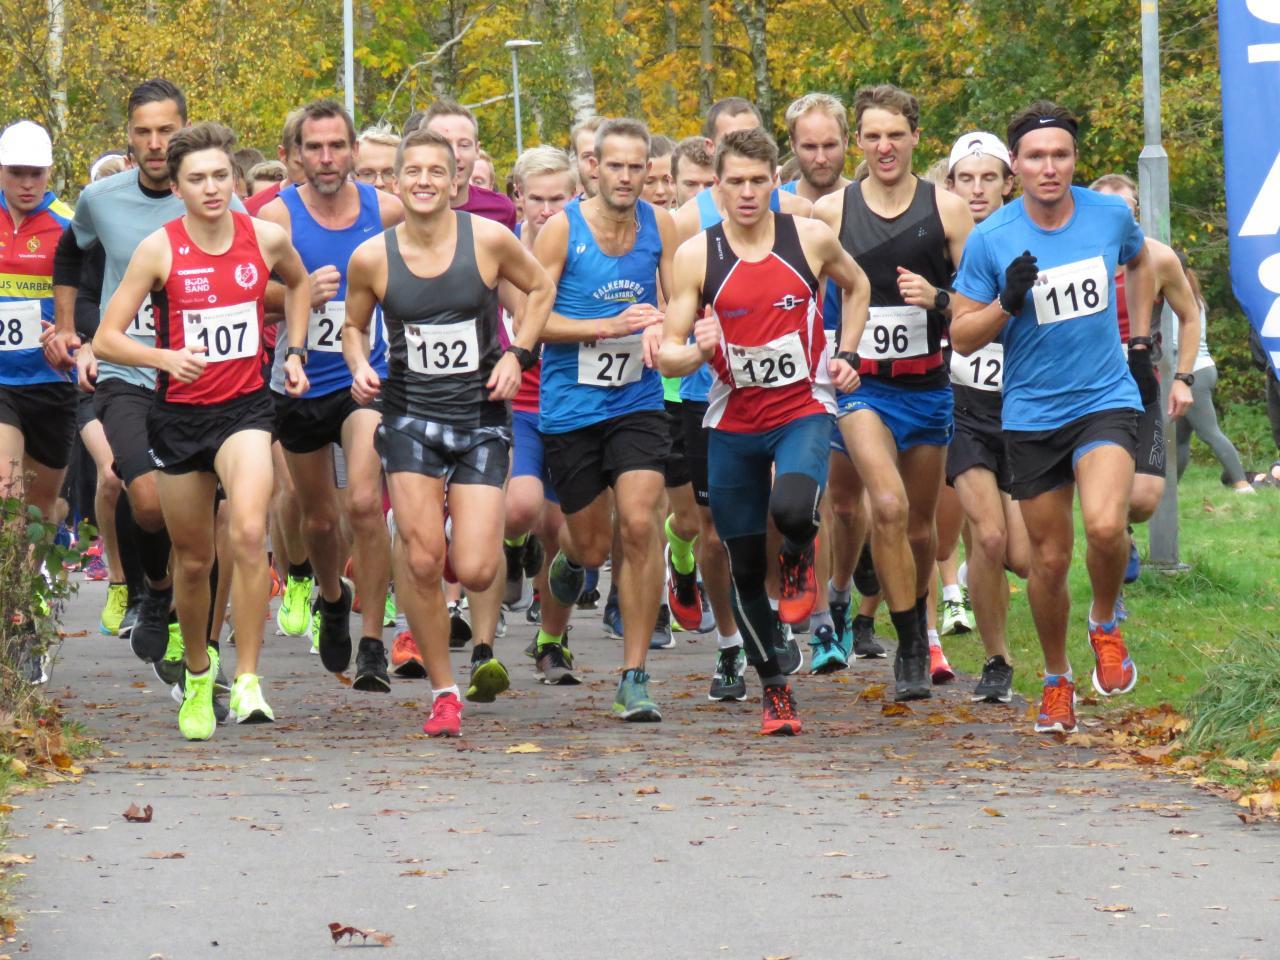 Varberg Halvmarathon